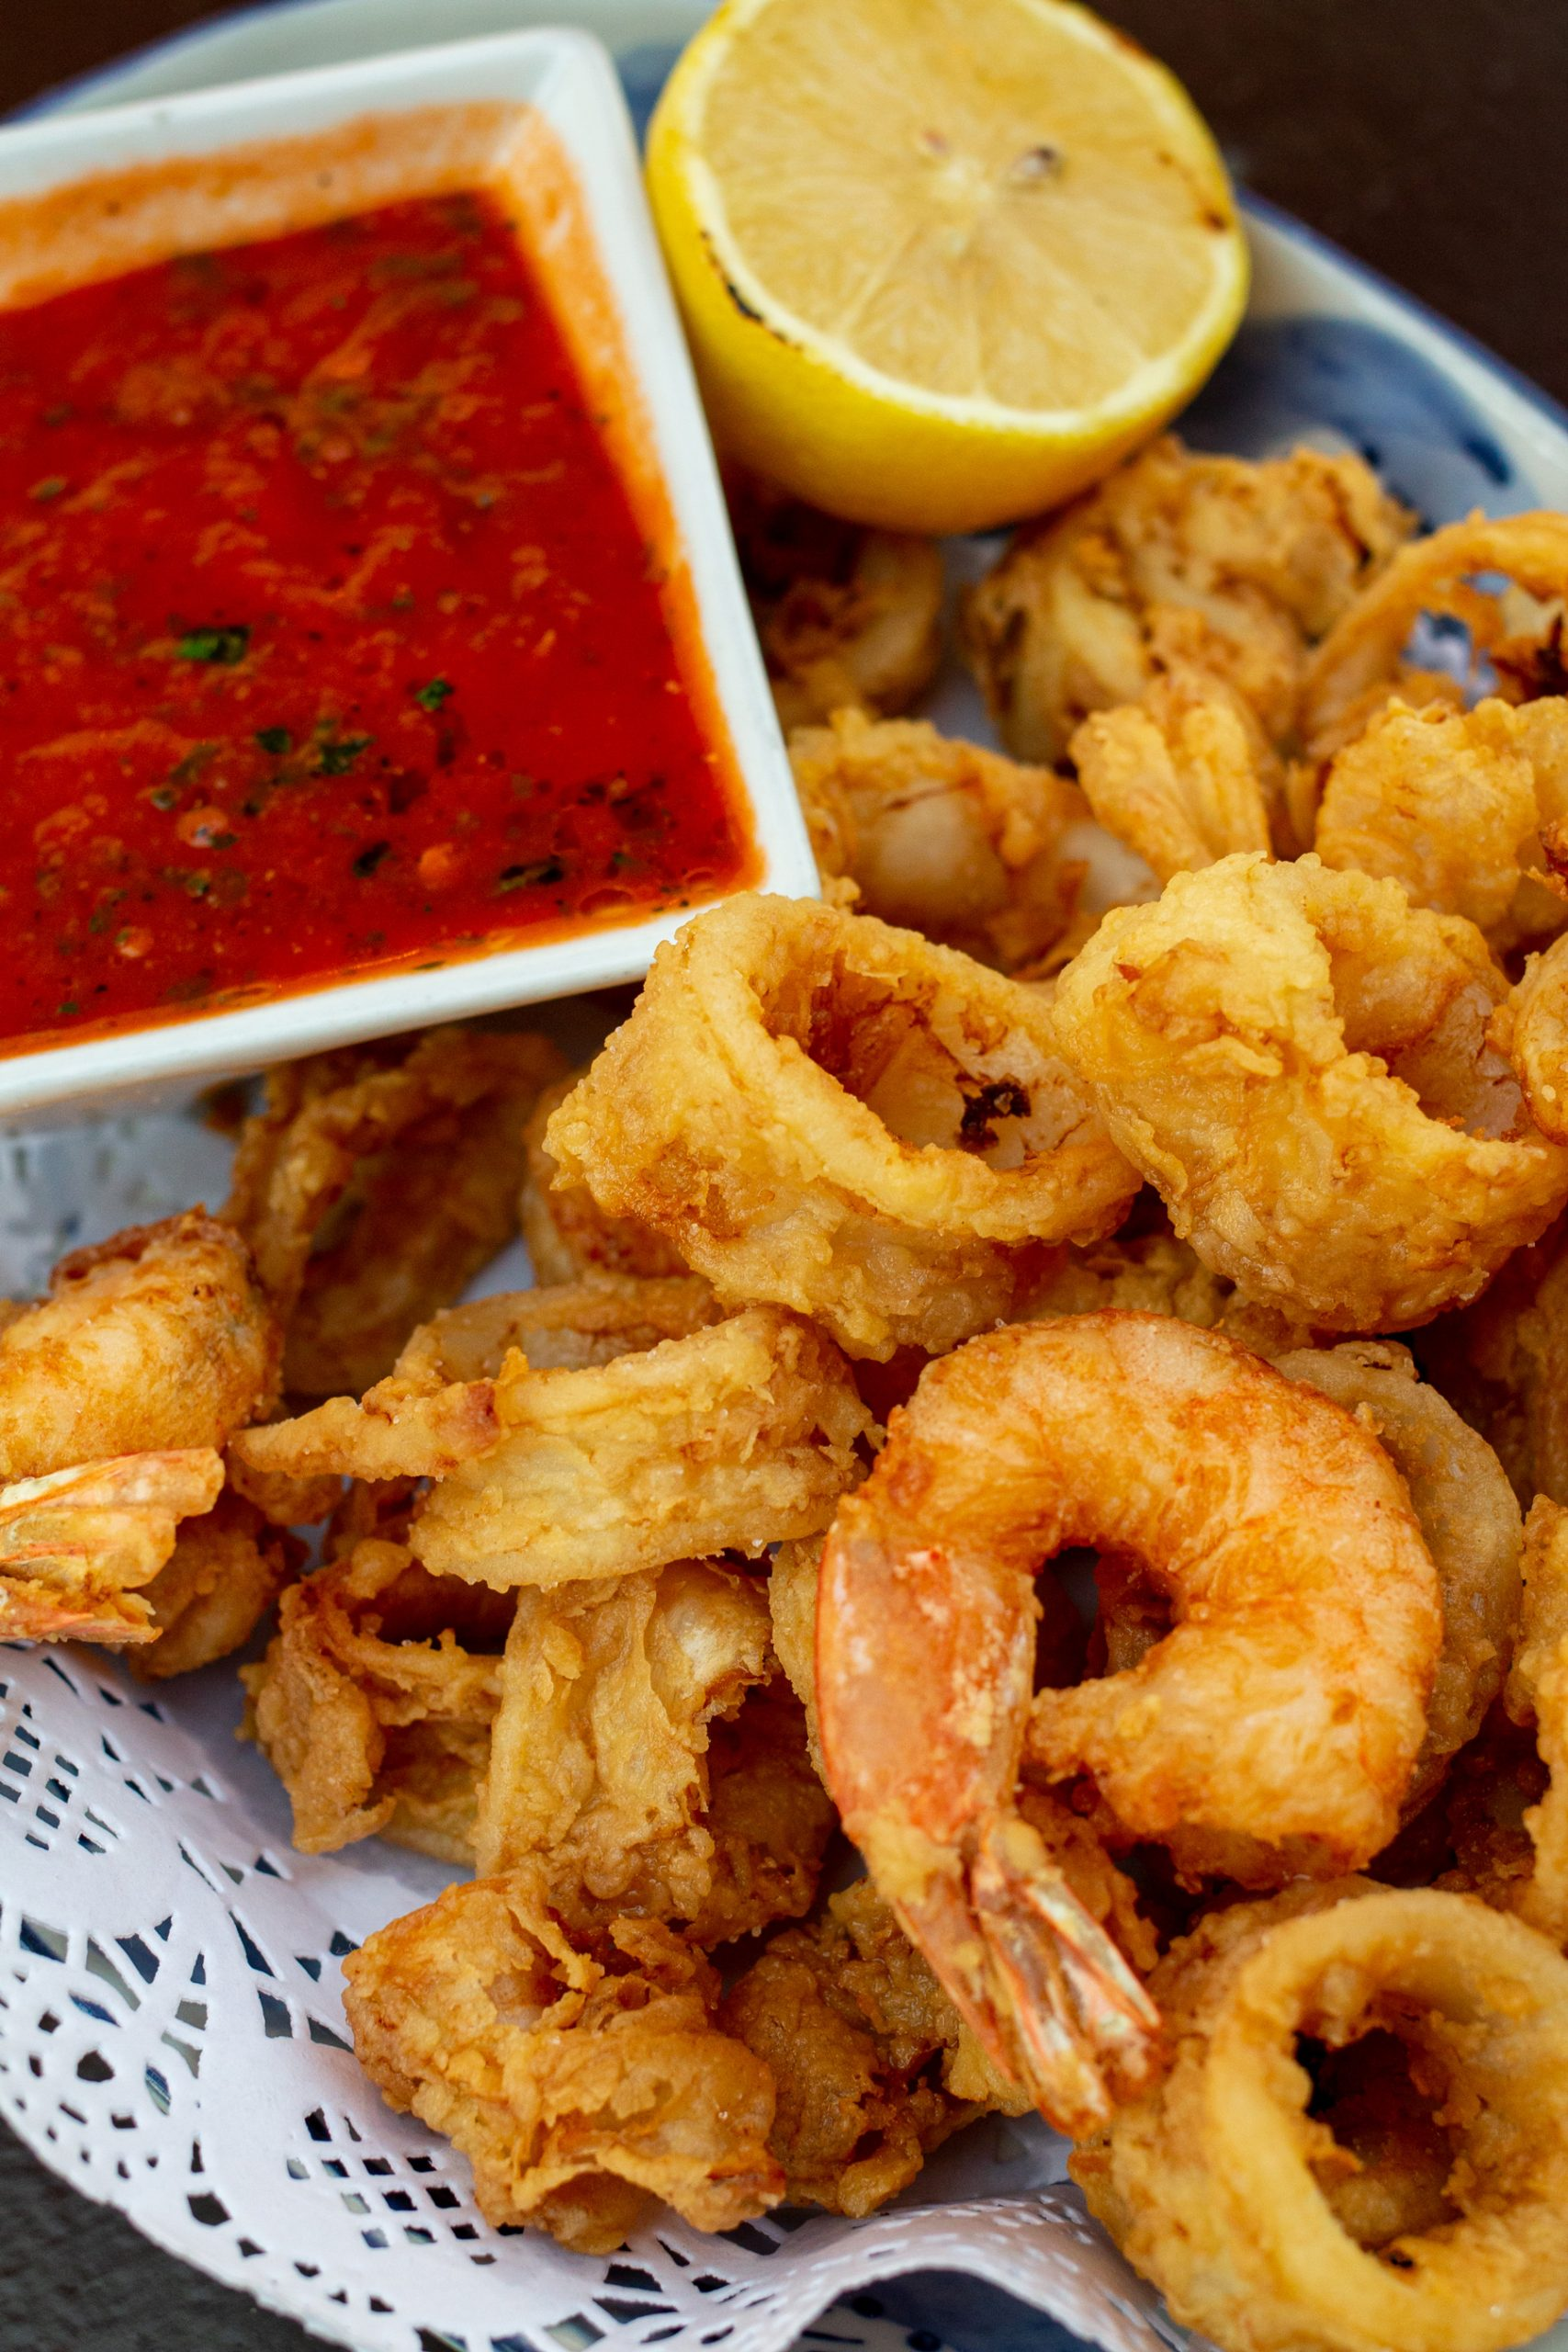 Crispy calamari and shrimp with a side of marinara.